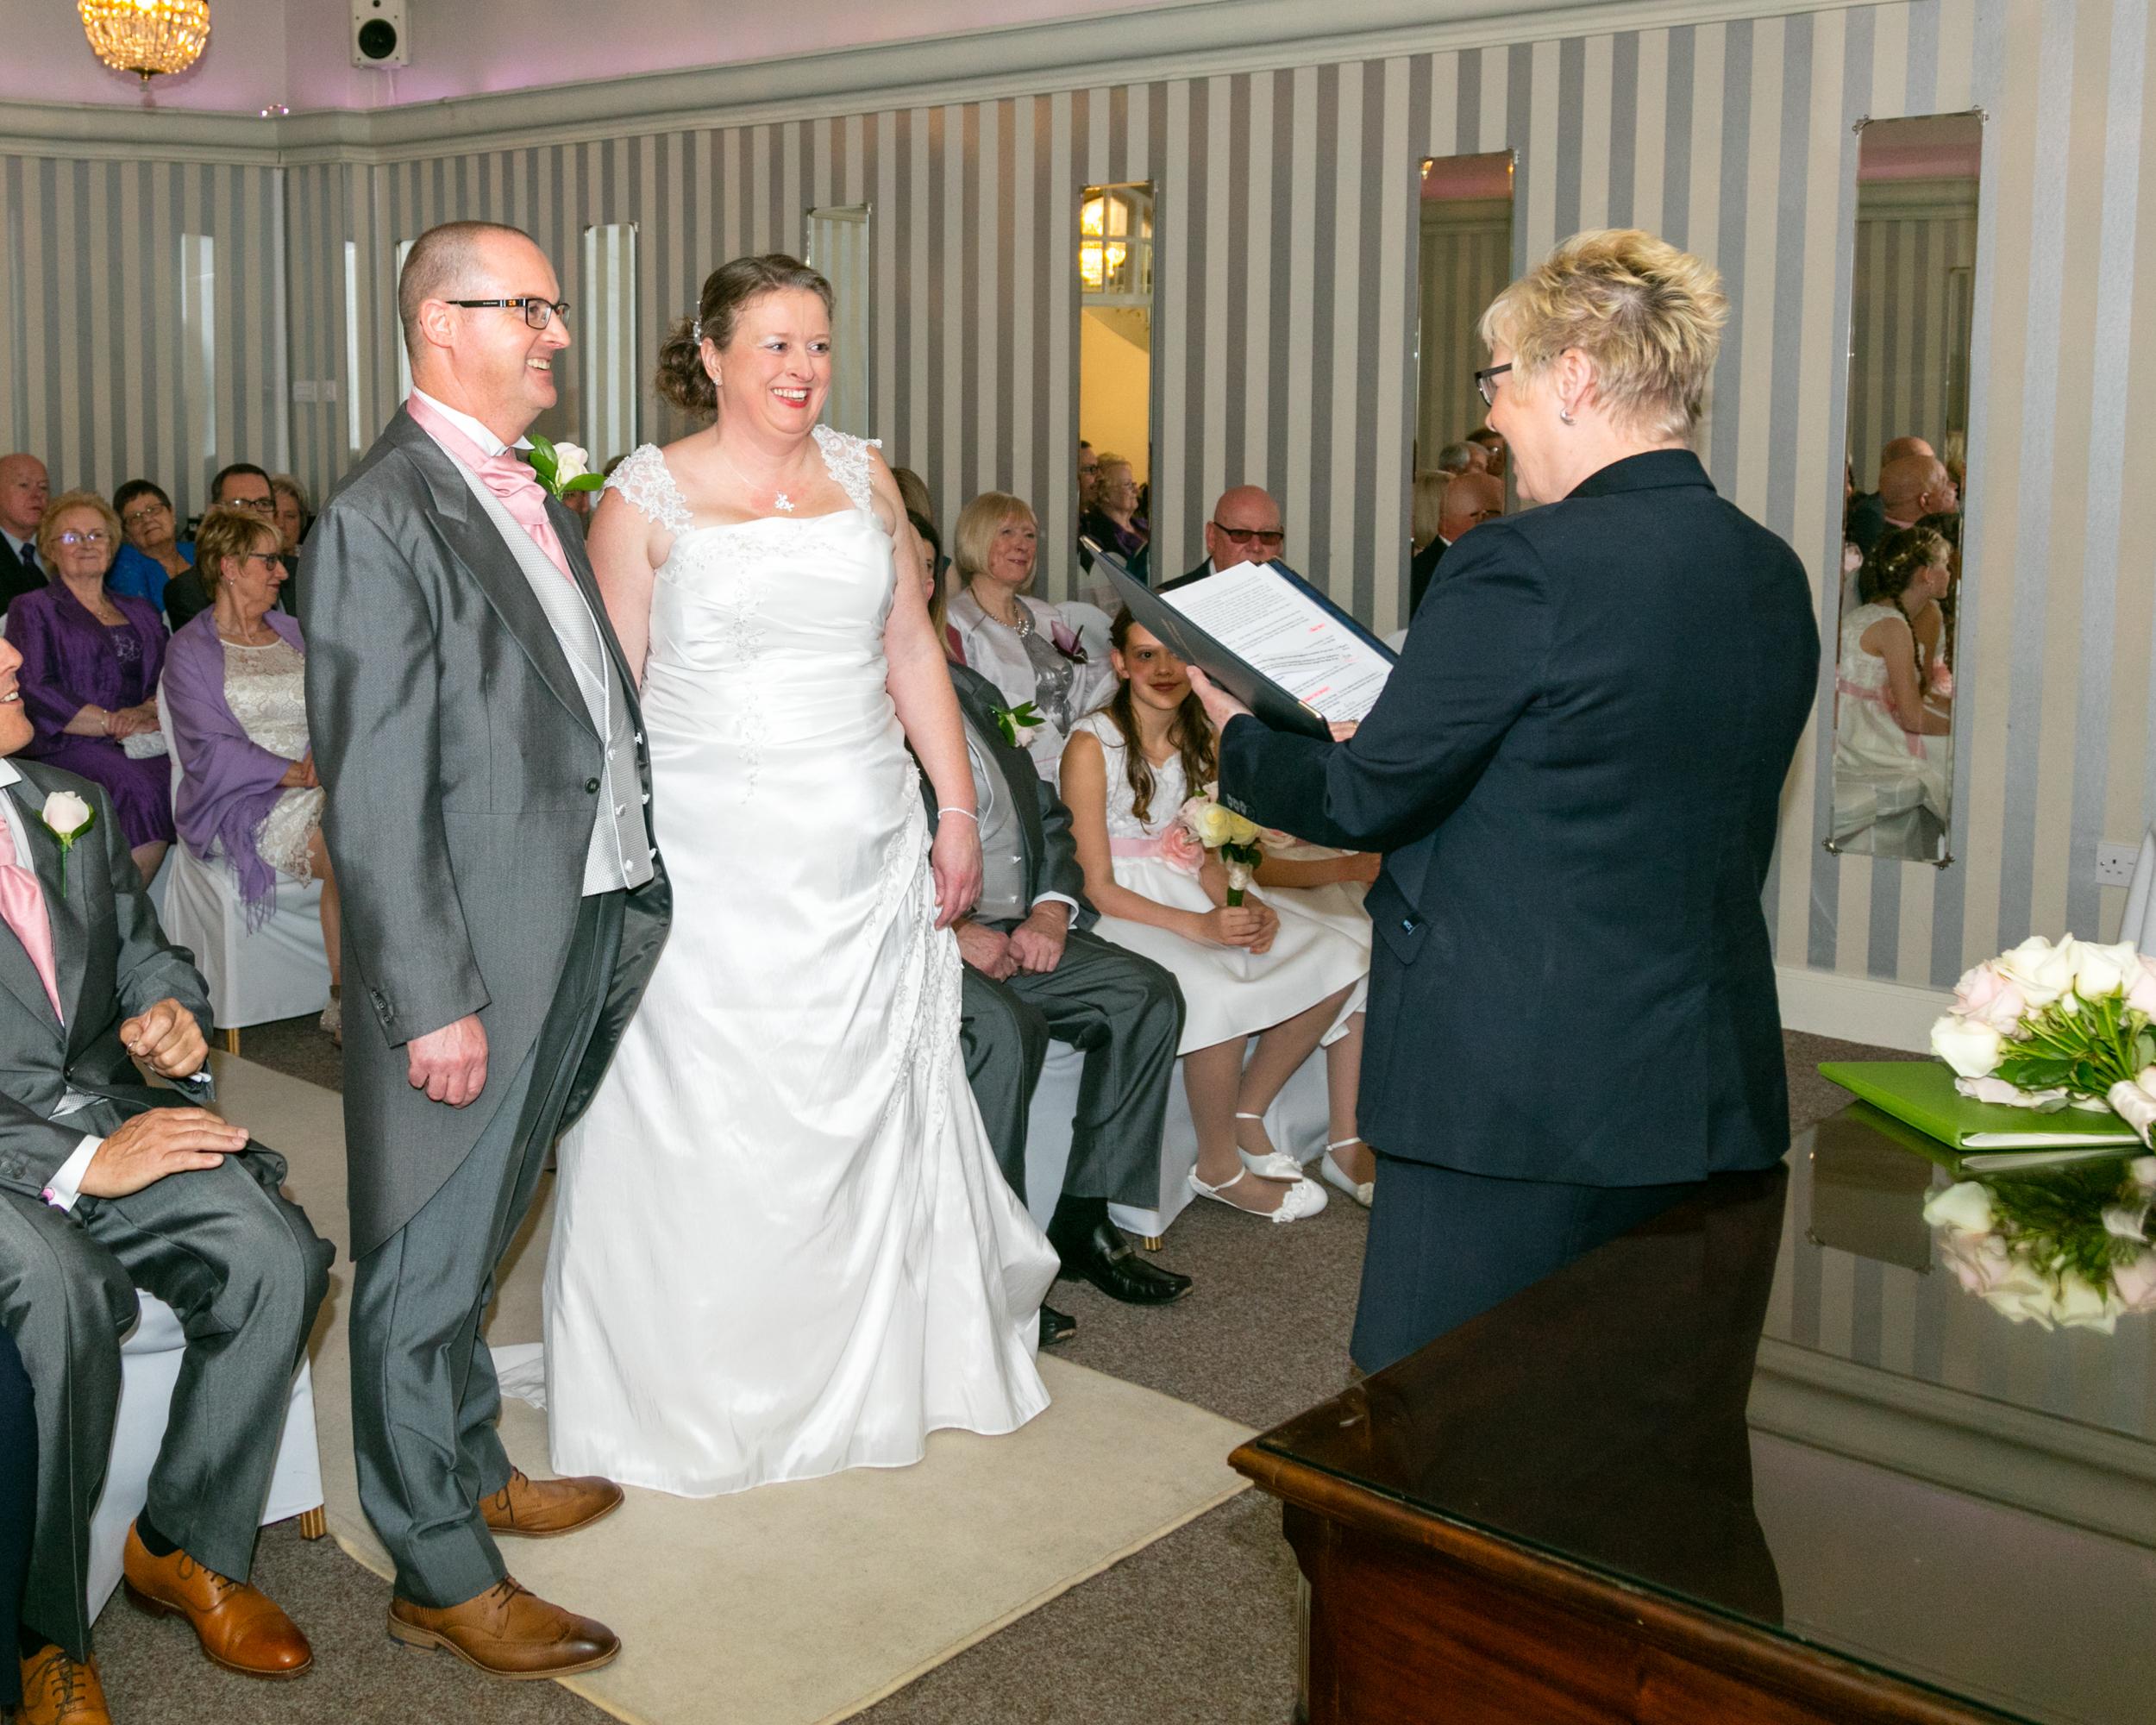 wedding-photography-Warwick-House-Southam04.jpg